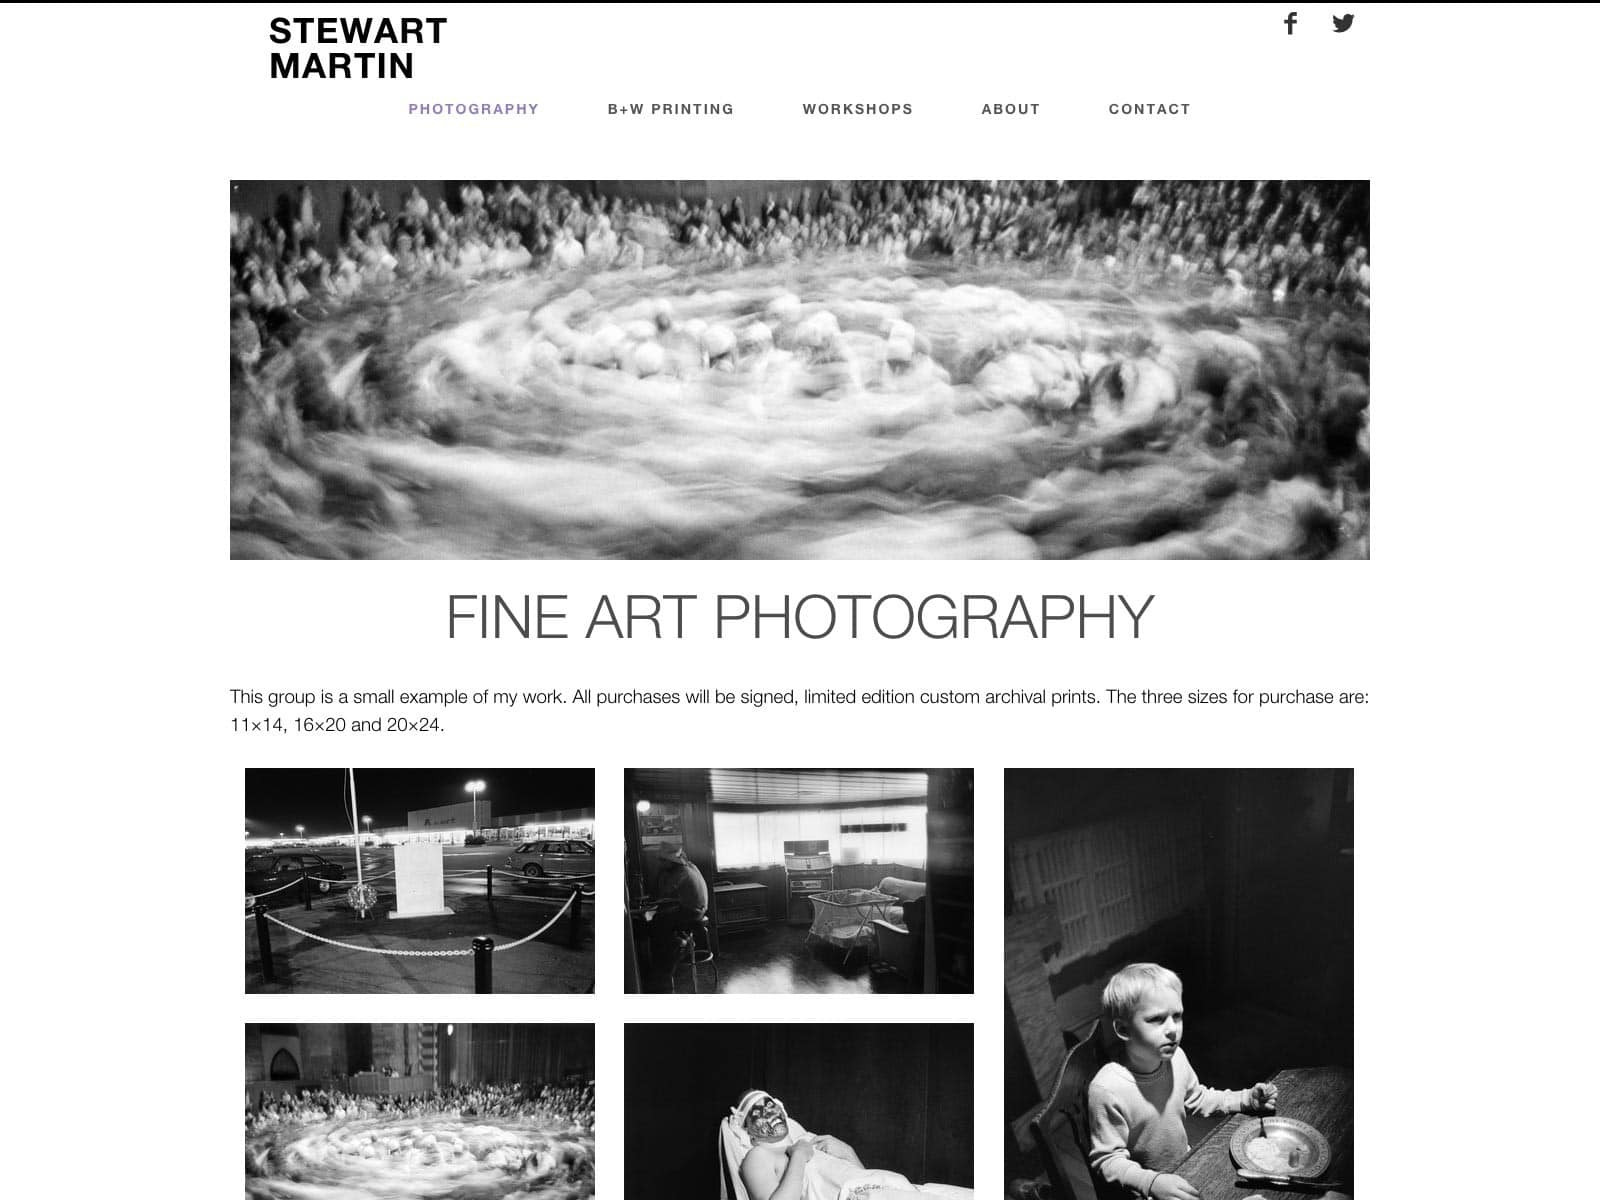 martin-lab-and-stewart-martin-photography-4